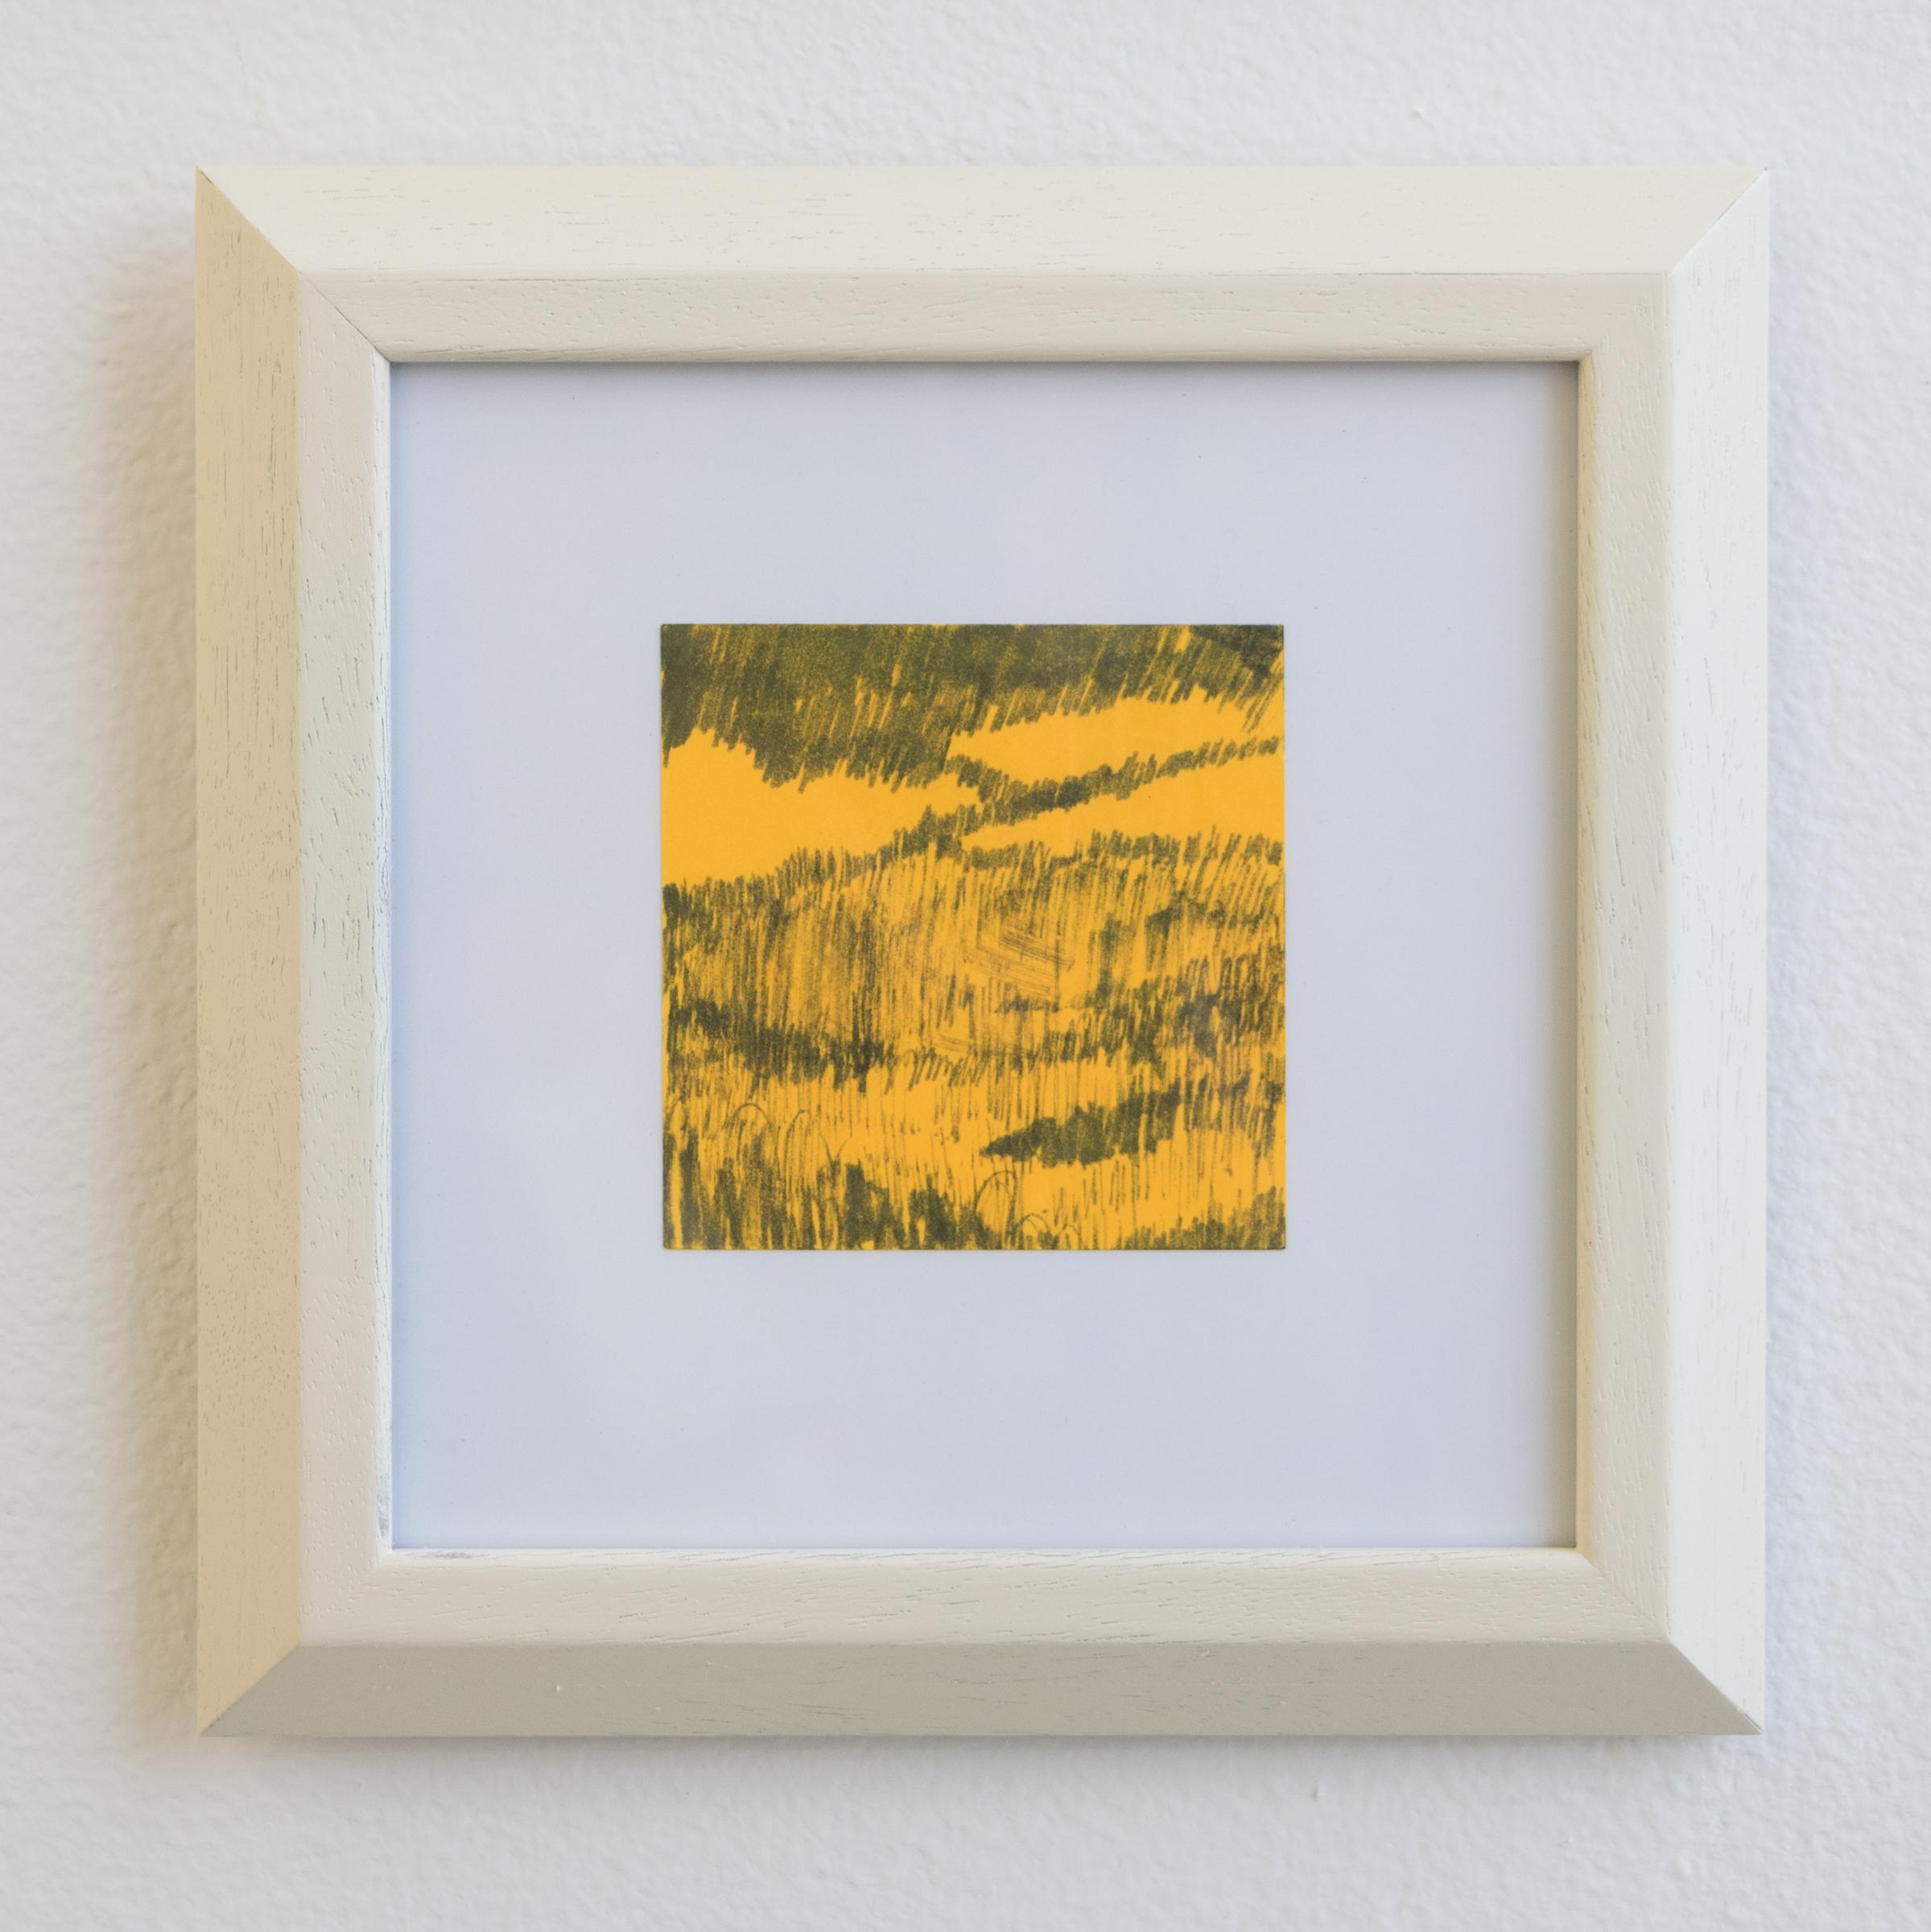 Landscape on Post-It #2